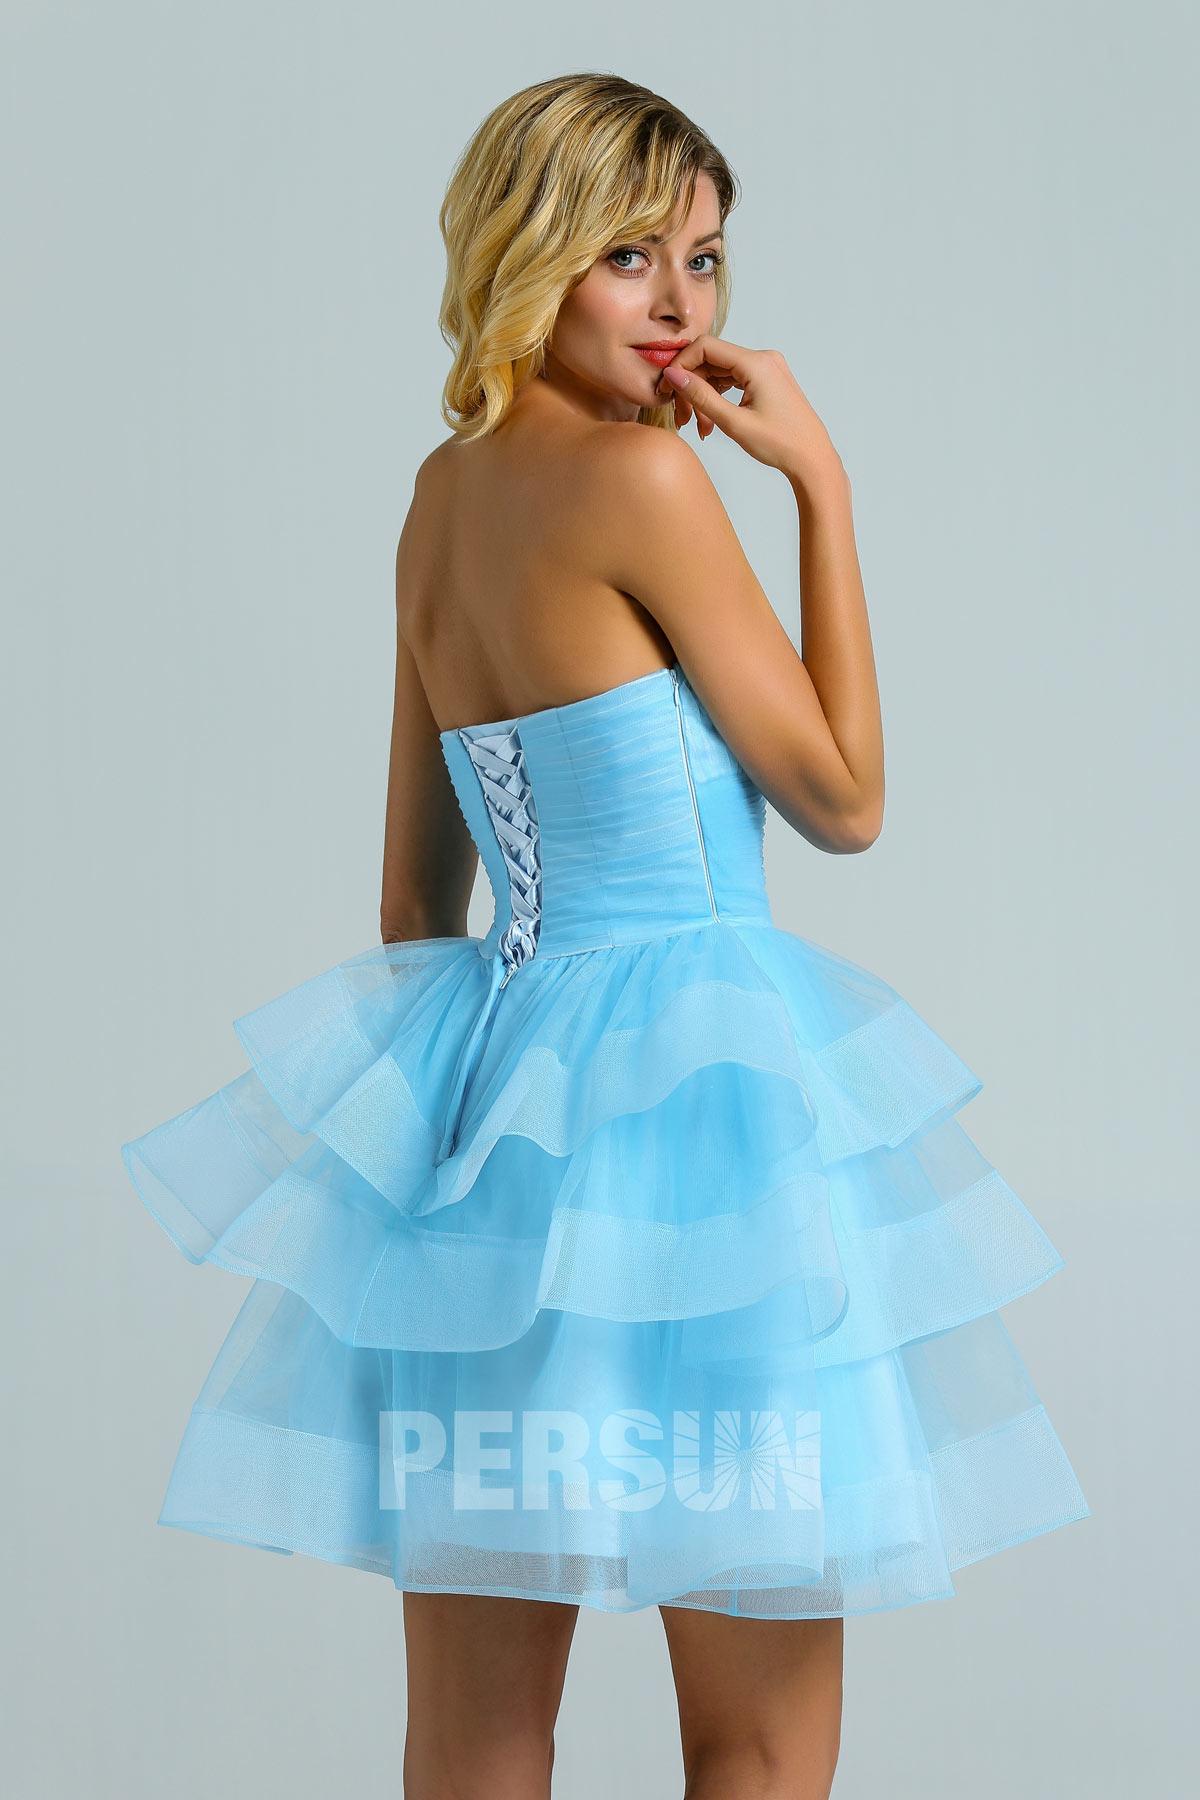 Mini robe de bal bleu ciel bustier coeur avec jupe patineuse